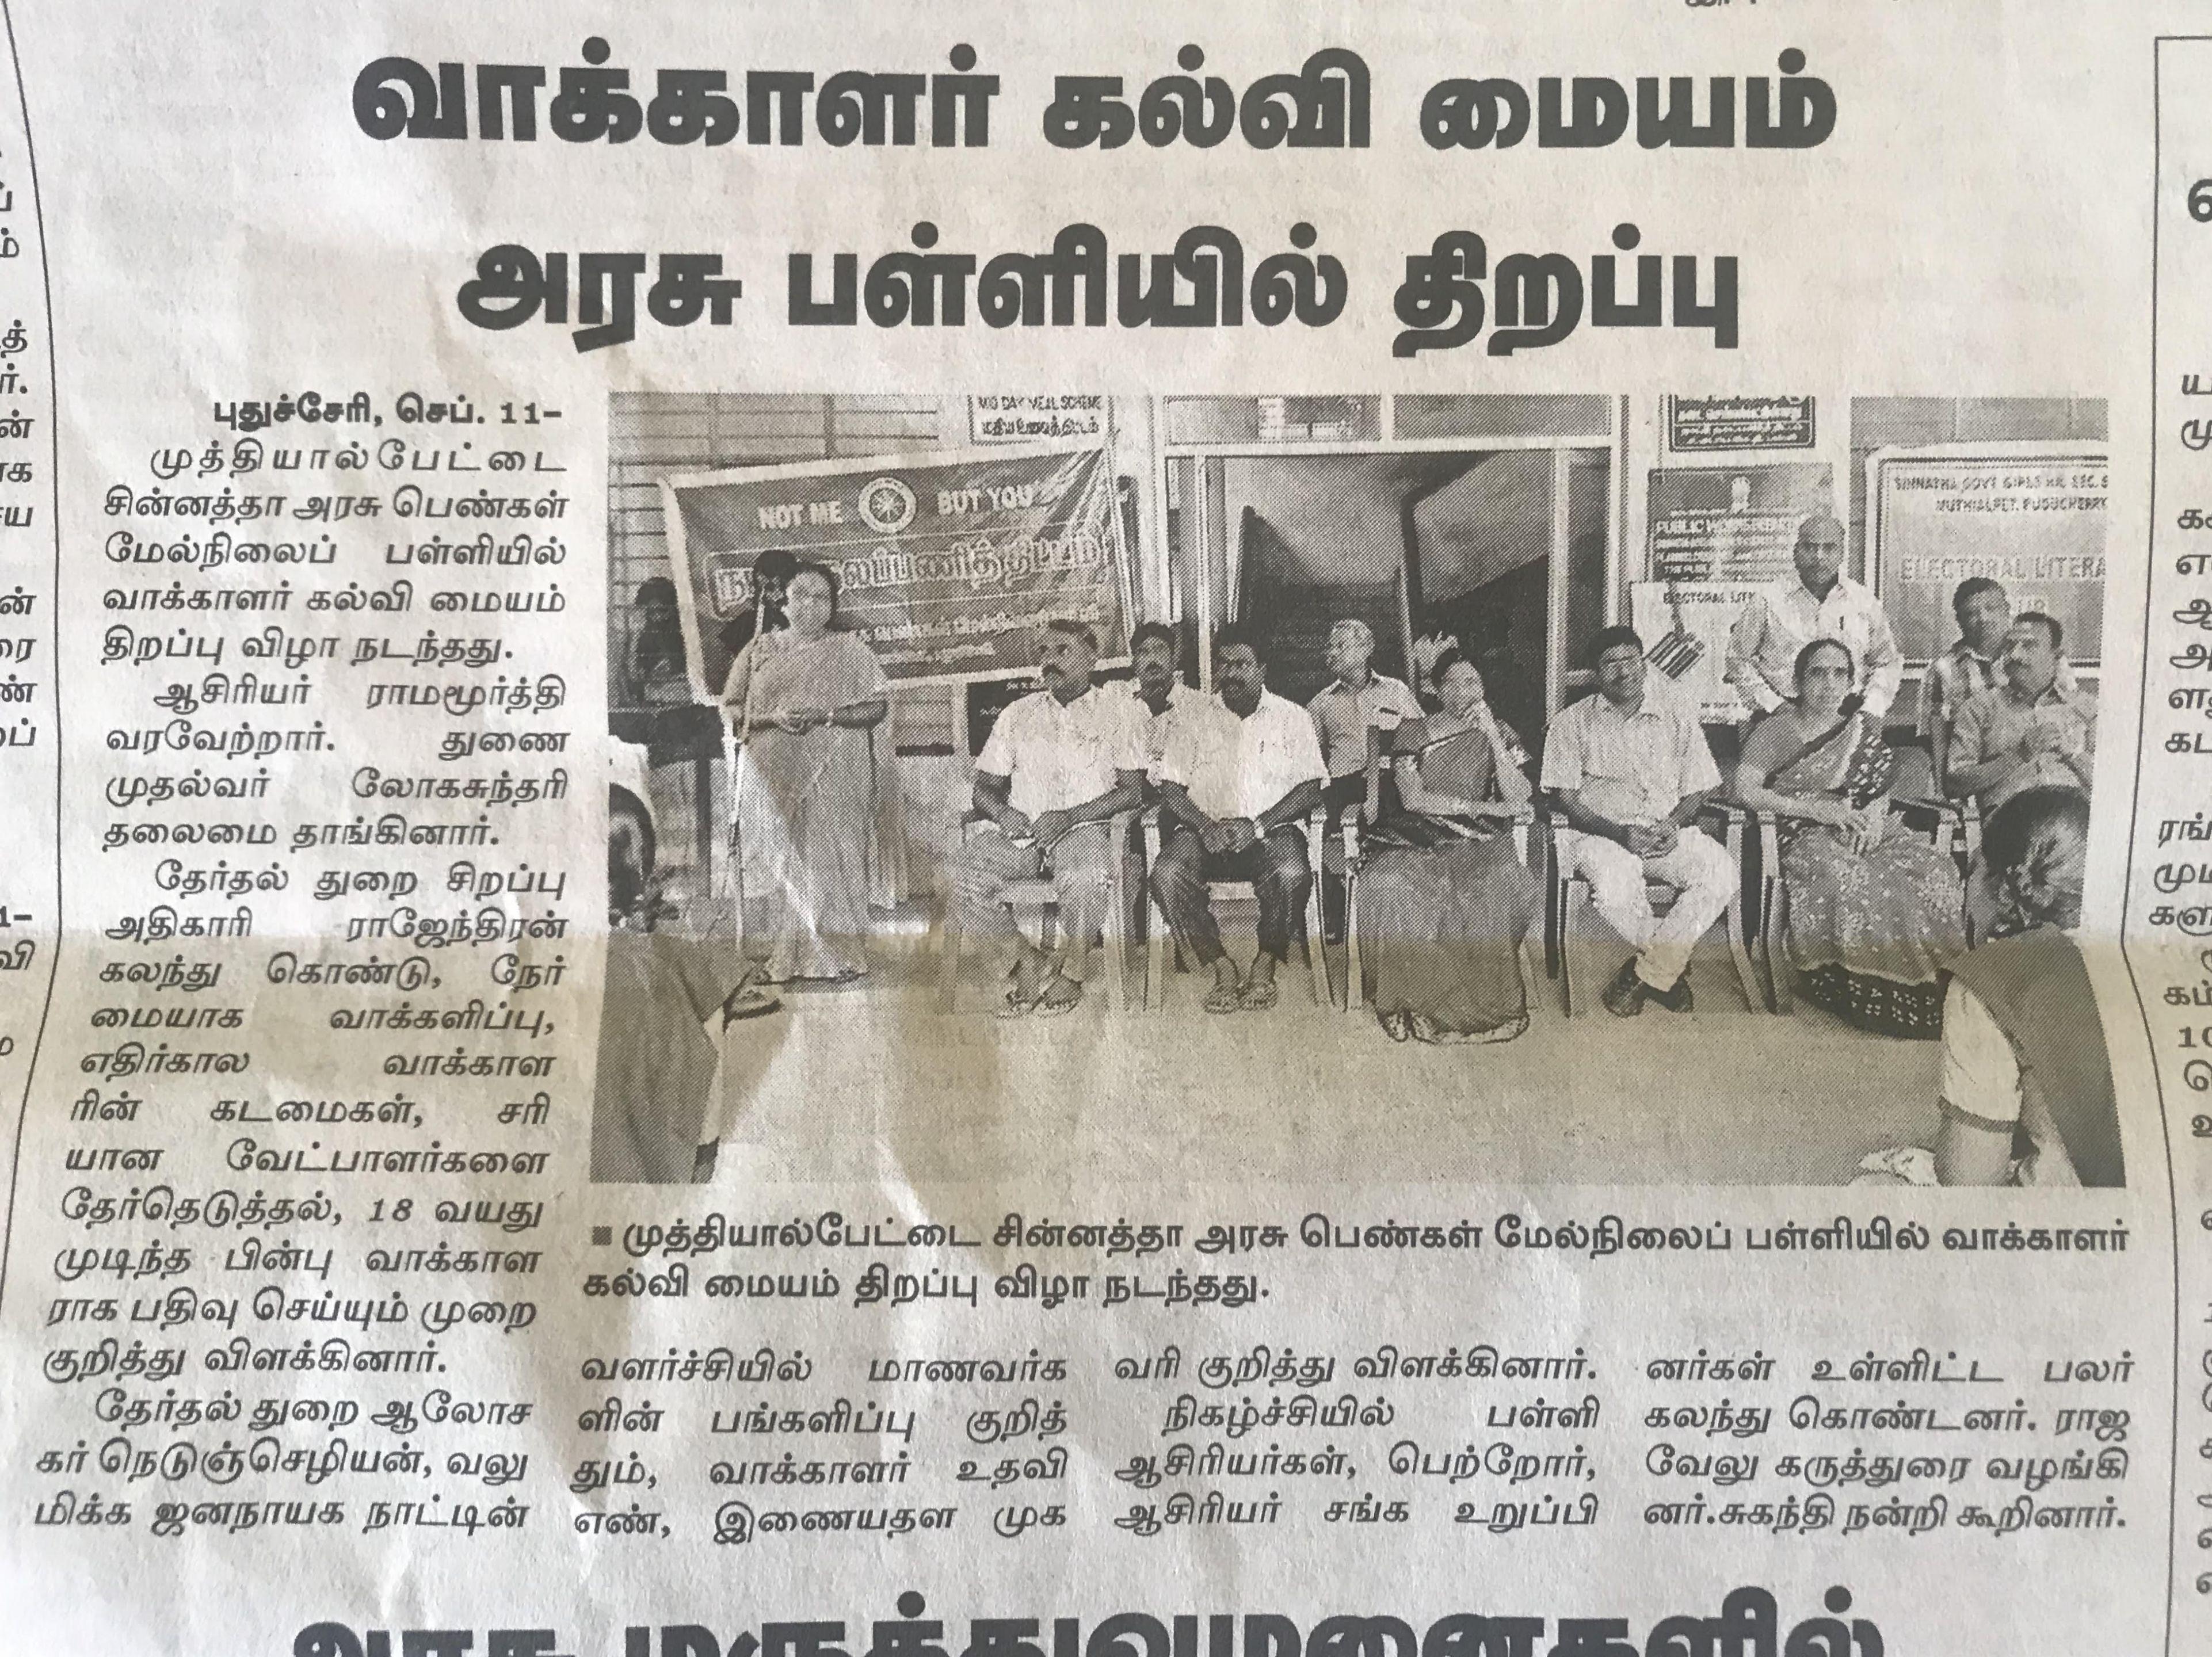 Newsitem regarding Electoral Literacy Club Inaugural Function at Sinnatha Govt Girls Higher Secondary School, Muthialpet, Puducherry